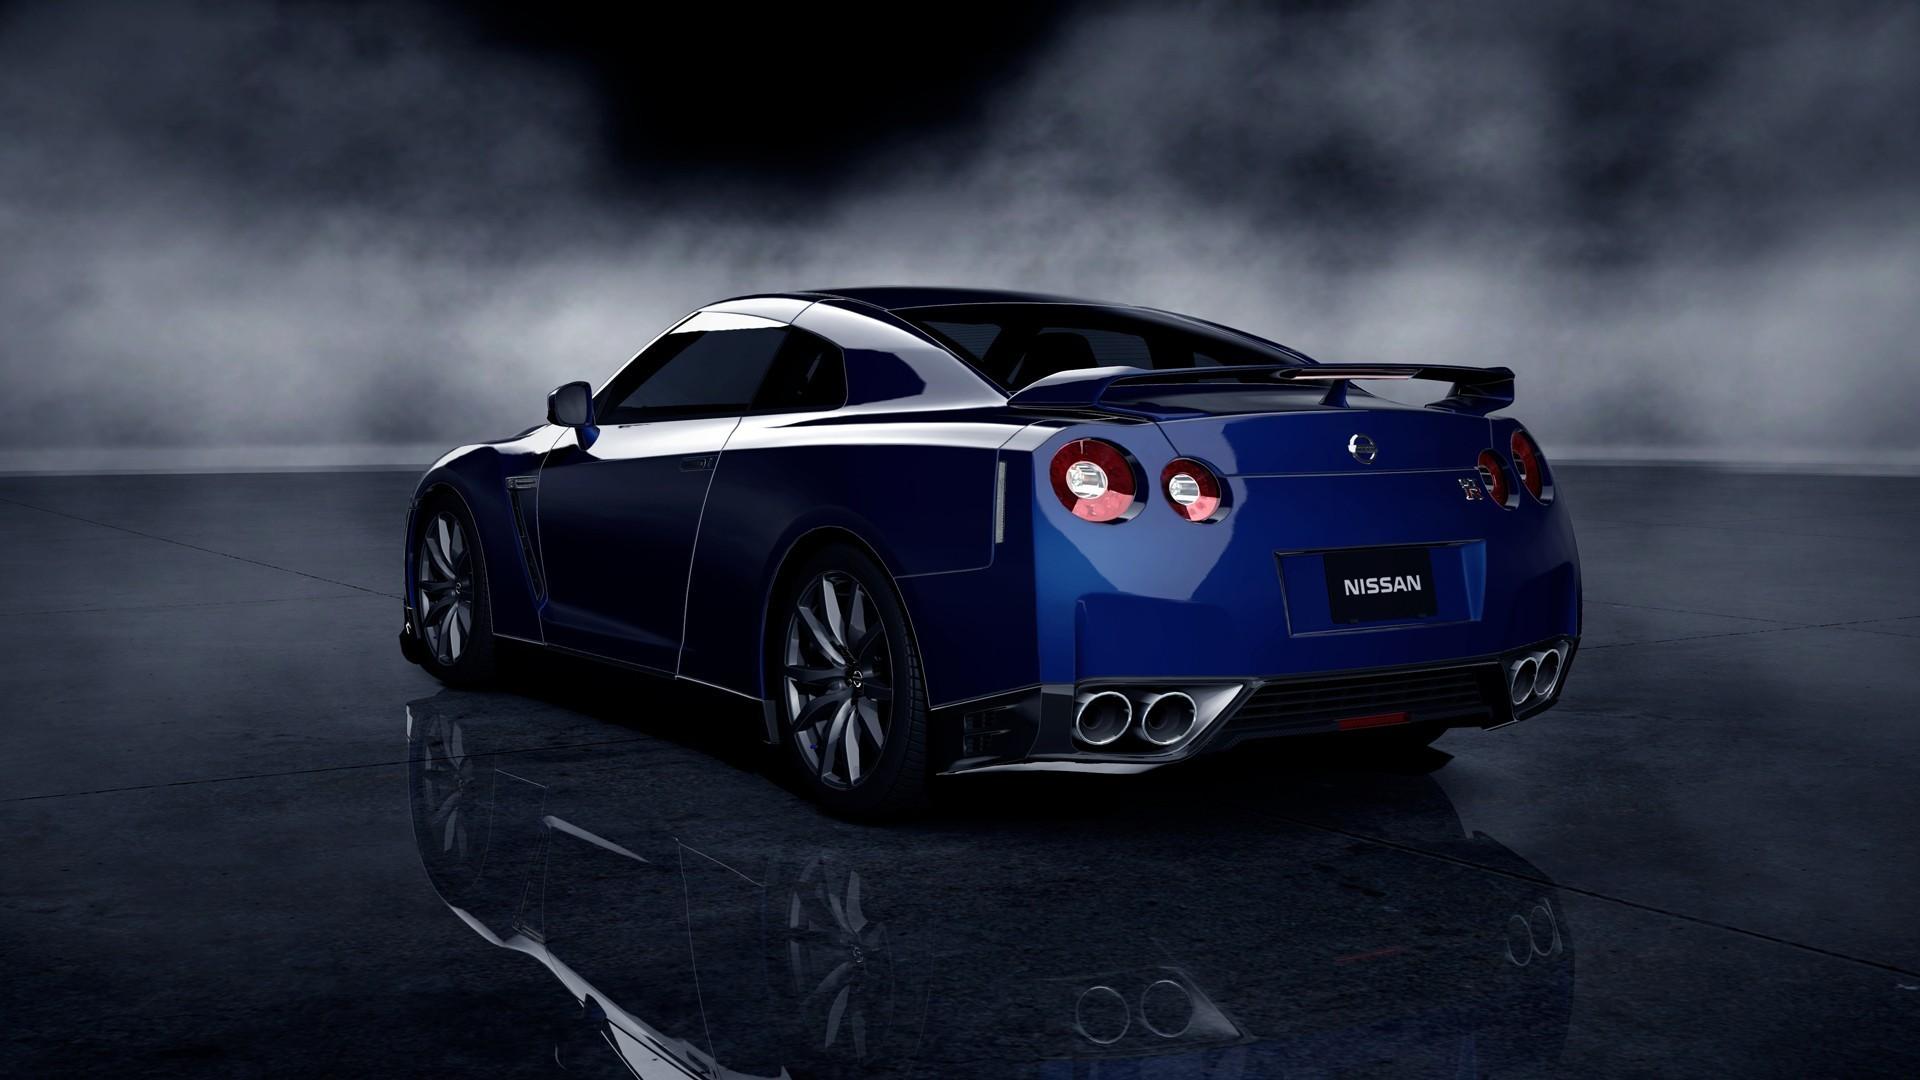 car, Nissan, The Crew, Blue Cars, Nissan Skyline GT R R34 Wallpaper HD